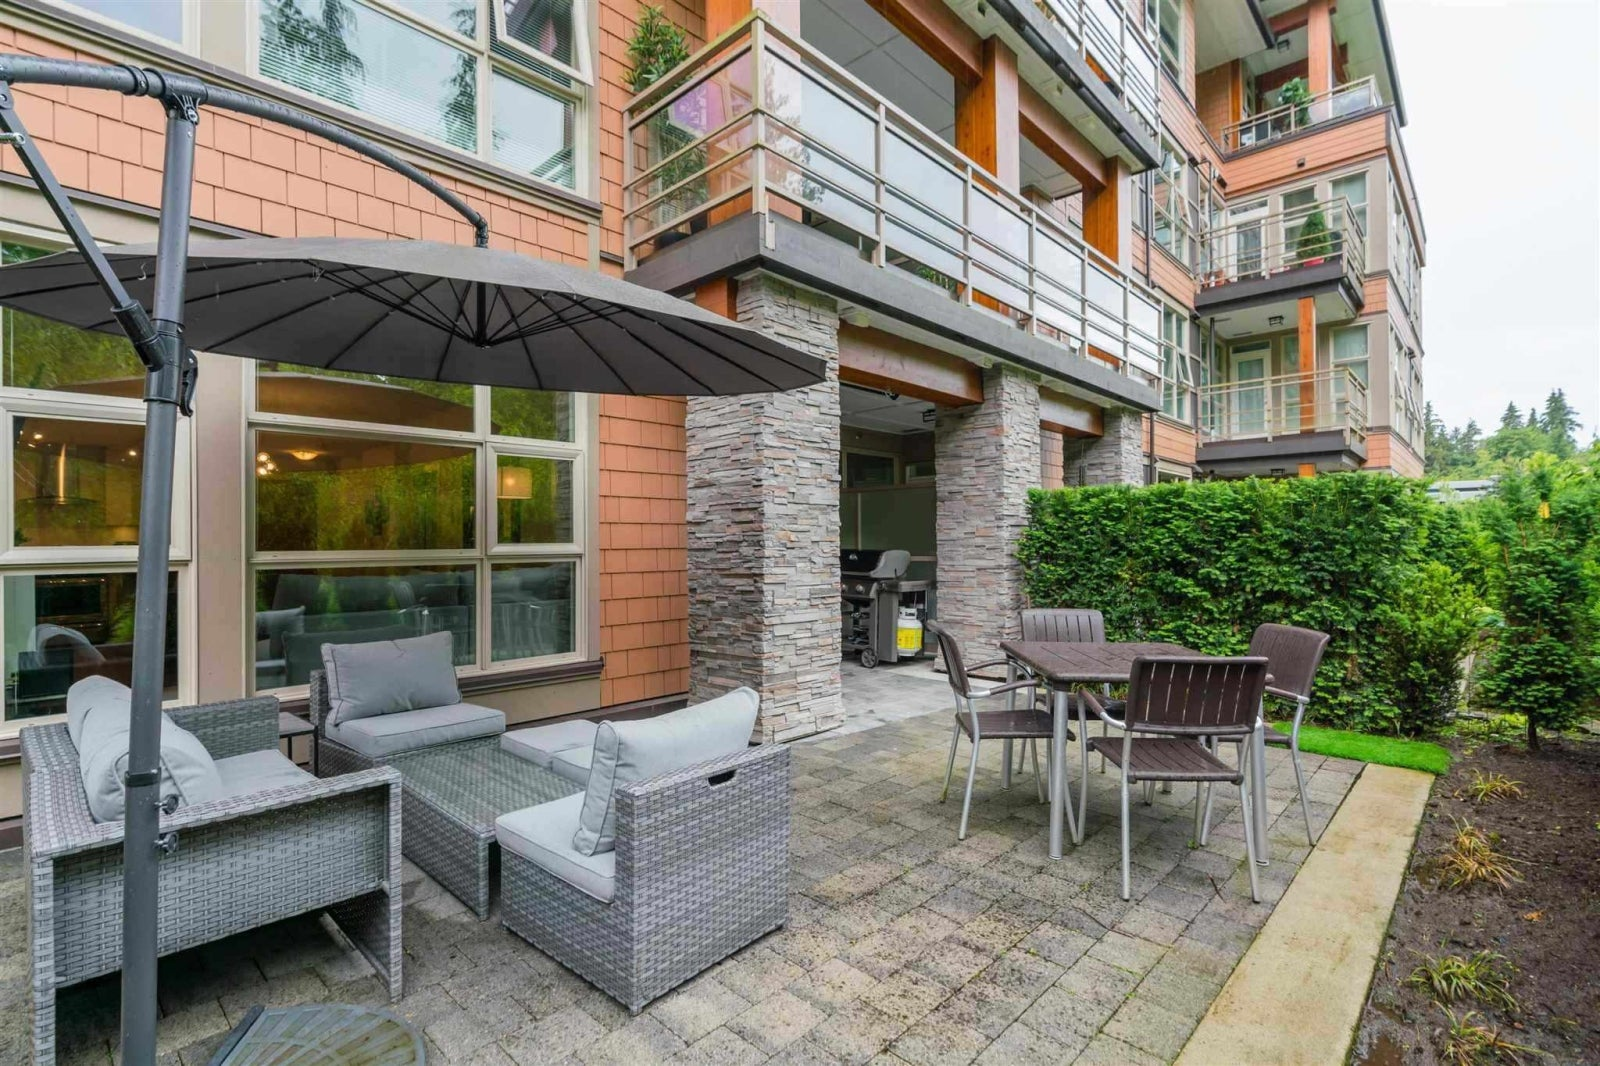 222 3602 ALDERCREST DRIVE - Roche Point Apartment/Condo for sale, 2 Bedrooms (R2603975) #4